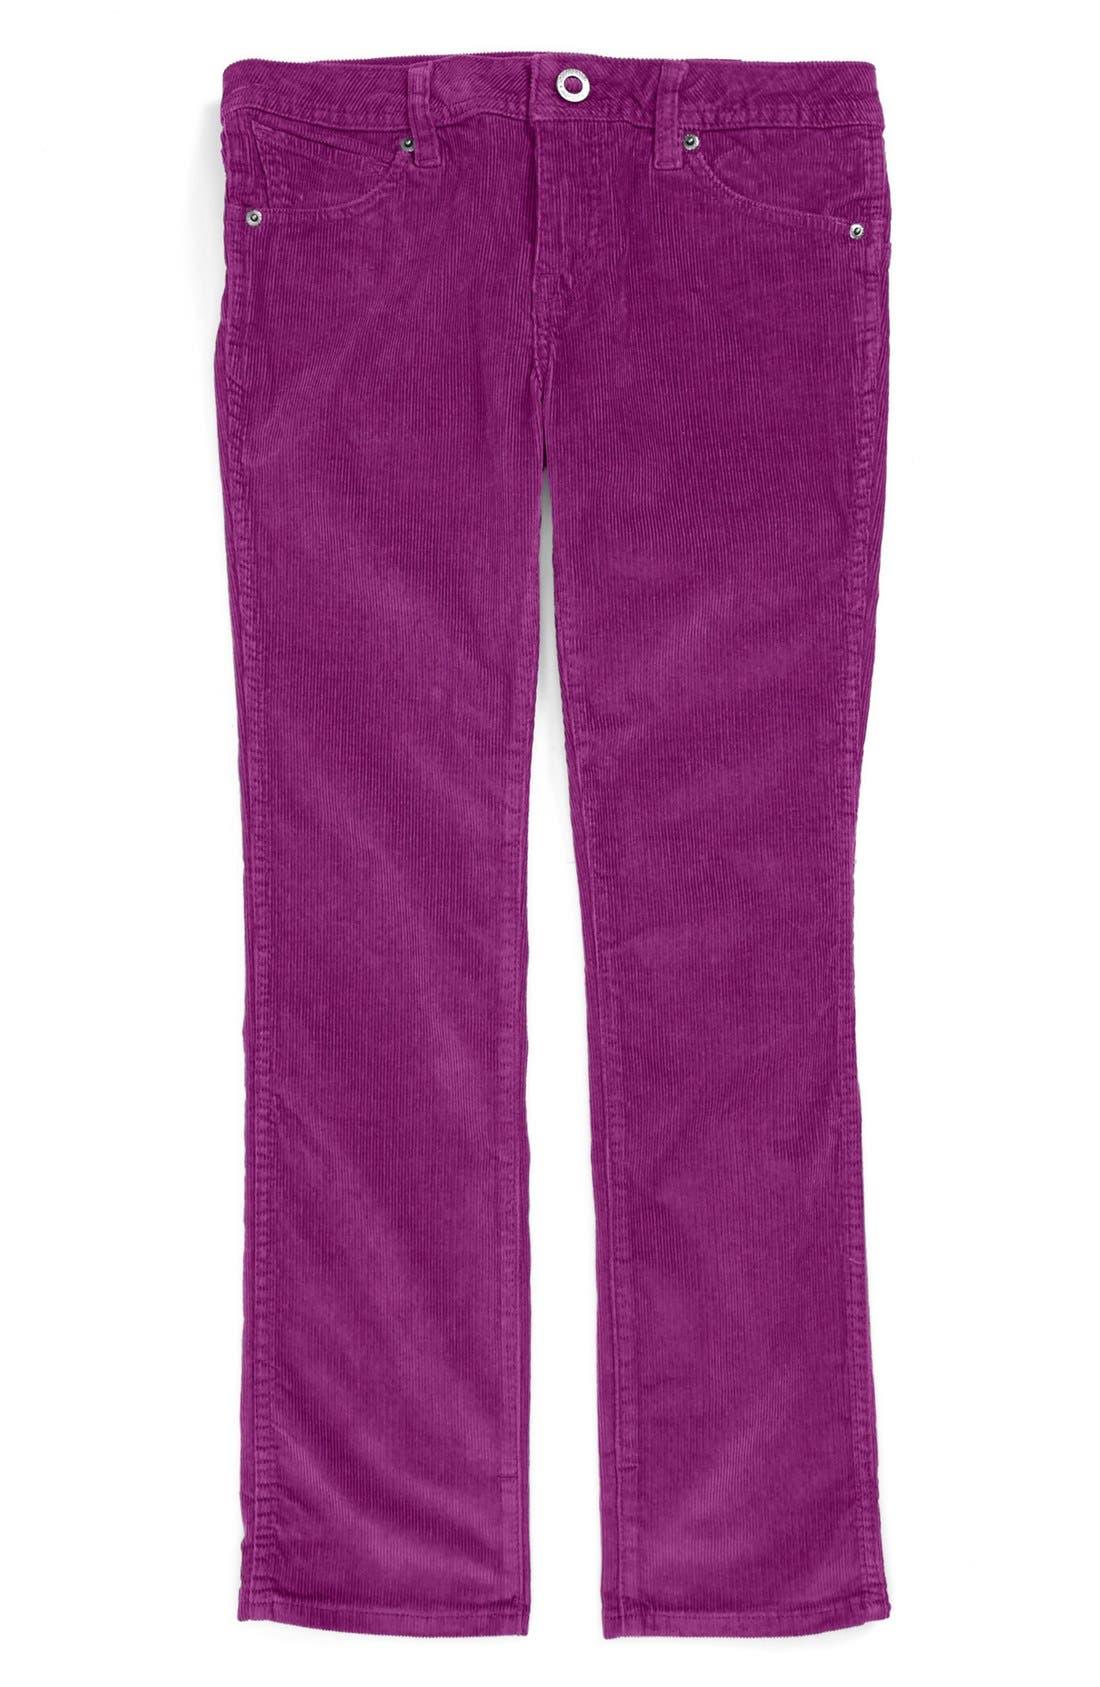 Main Image - Volcom '2X4' Corduroy Pants (Big Boys)